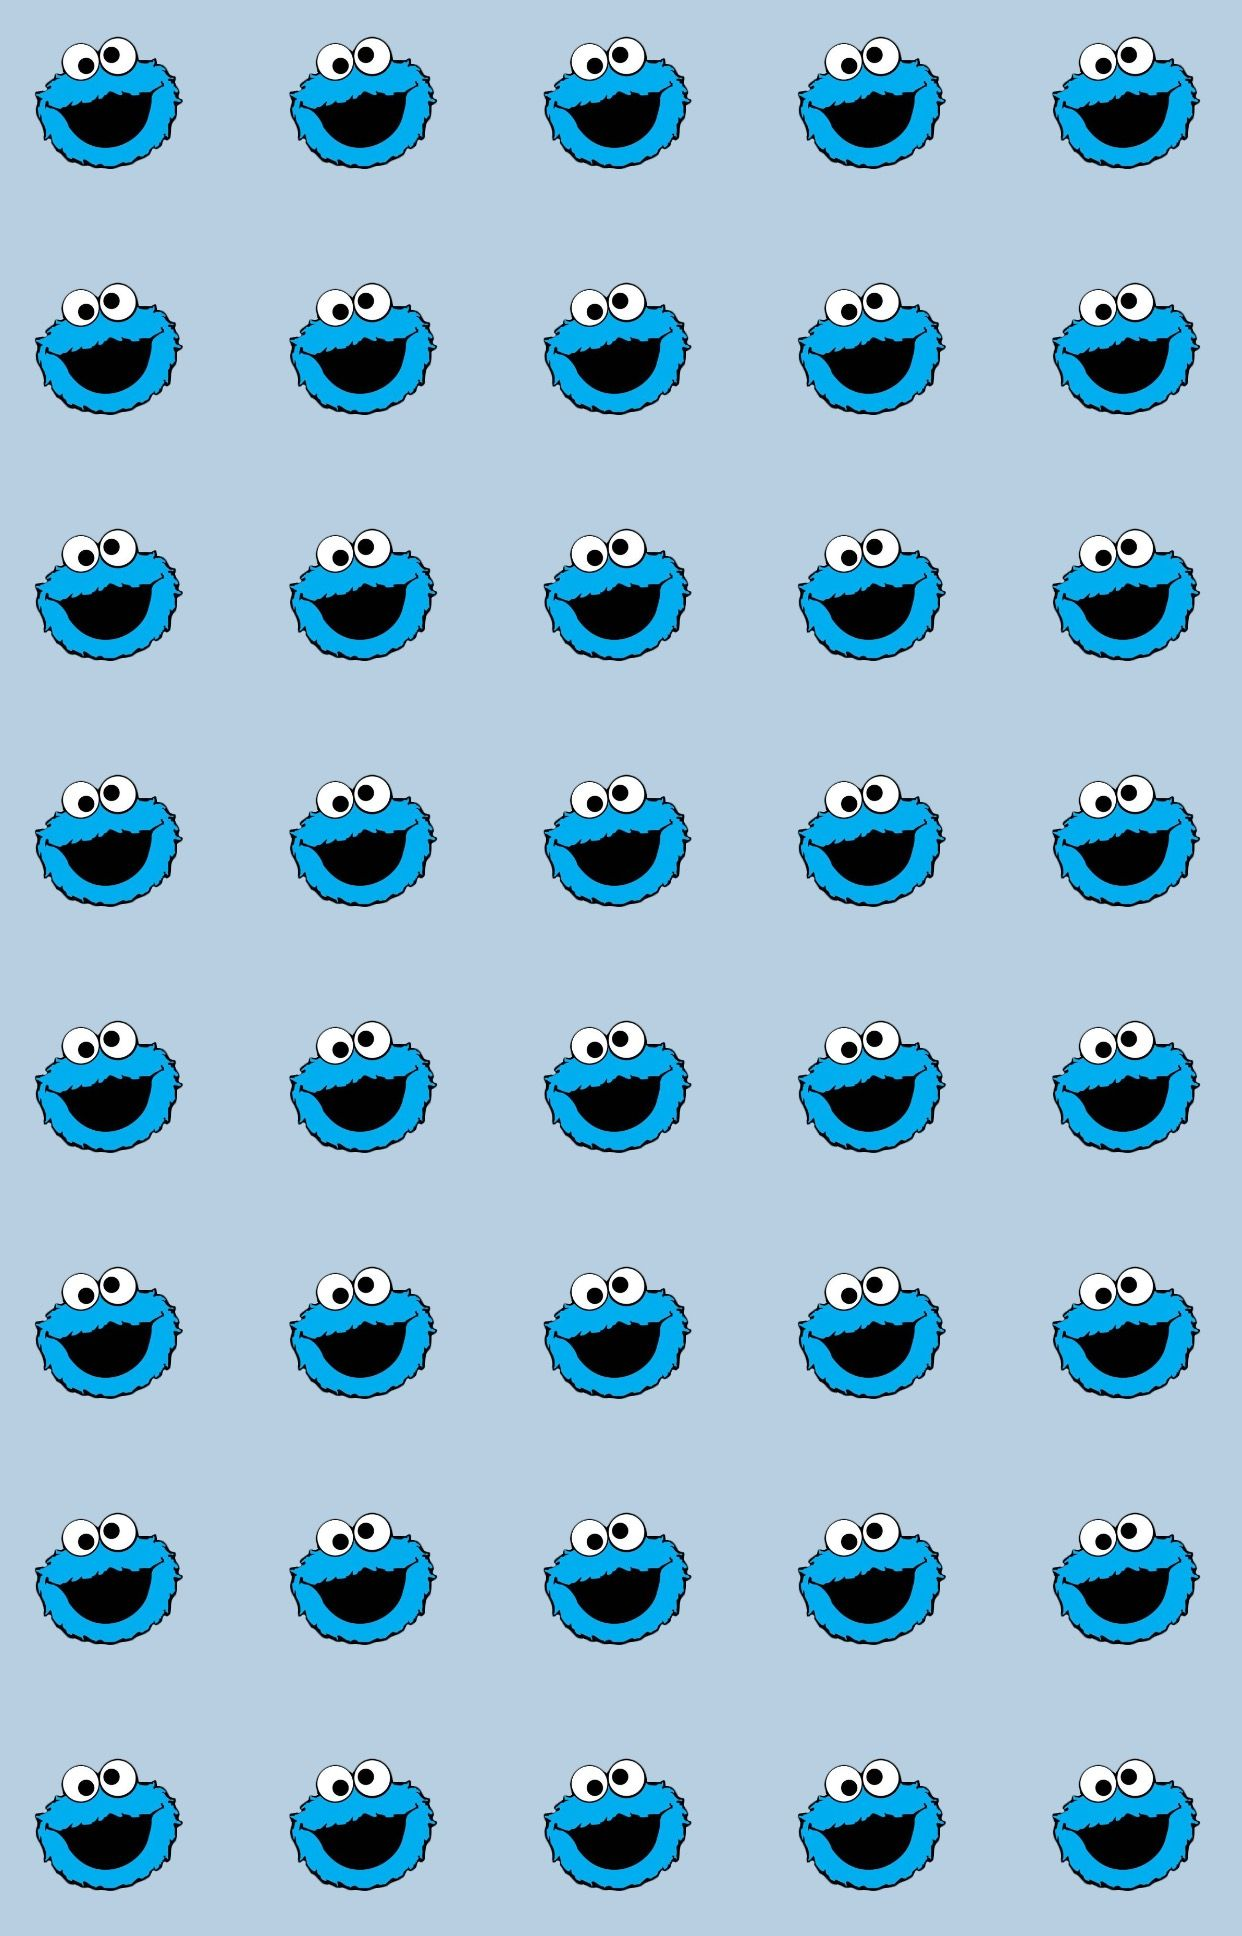 Cookies Monster Blue Wallpaper Iphone Cookie Monster Wallpaper Elmo Wallpaper